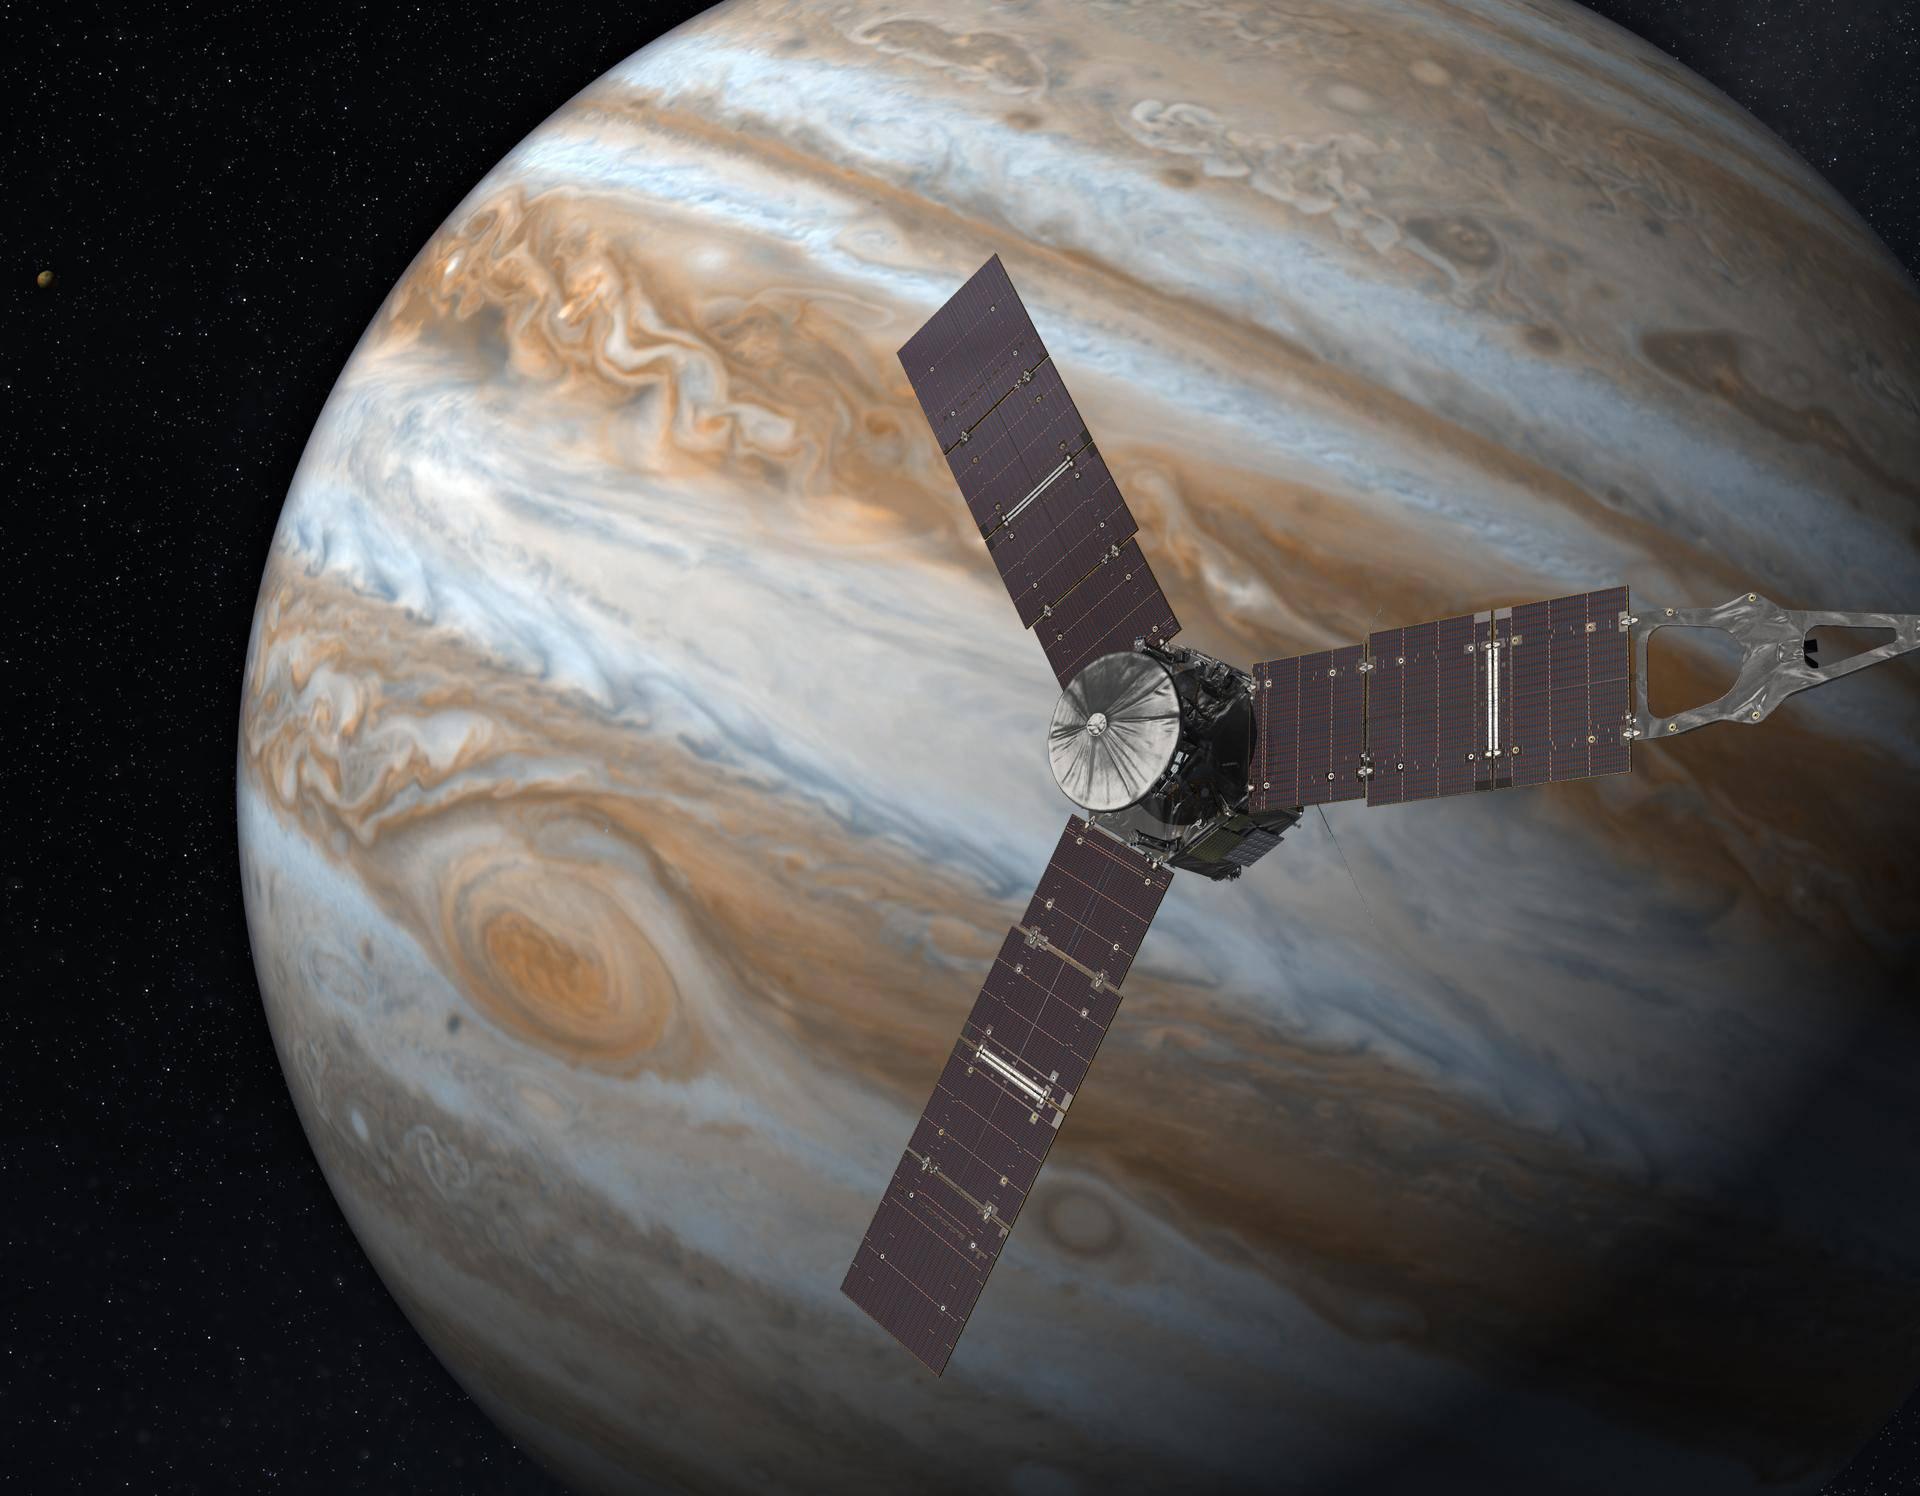 Najbrža svemirska sonda: Juno će razotkriti što skriva Jupiter